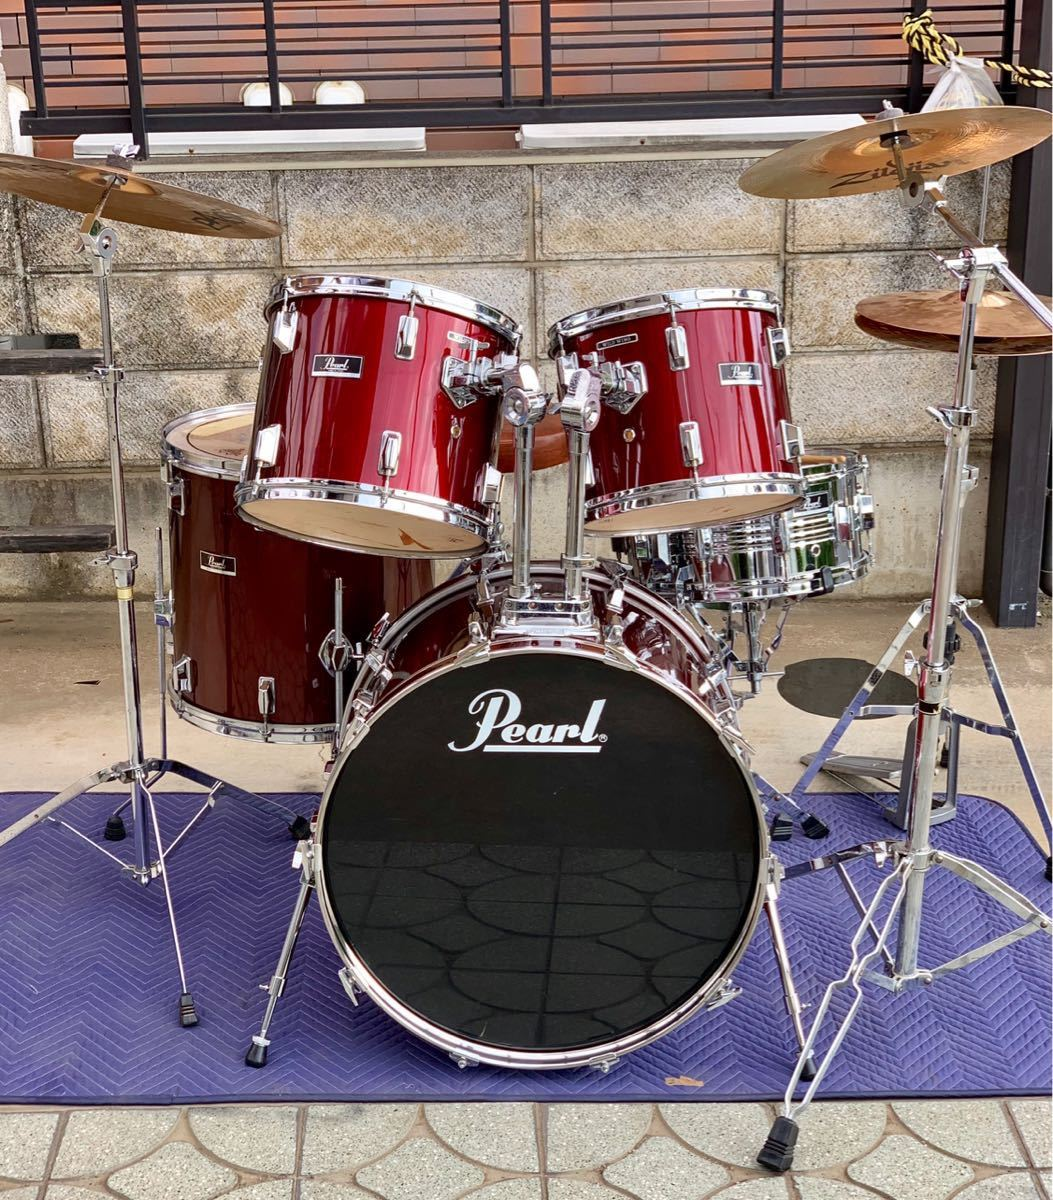 ☆Pearl/パール80'ドラムセット/WILD WINGシリーズ/日本製/程度良好!PAISTE&Zildjianシンバル_画像9